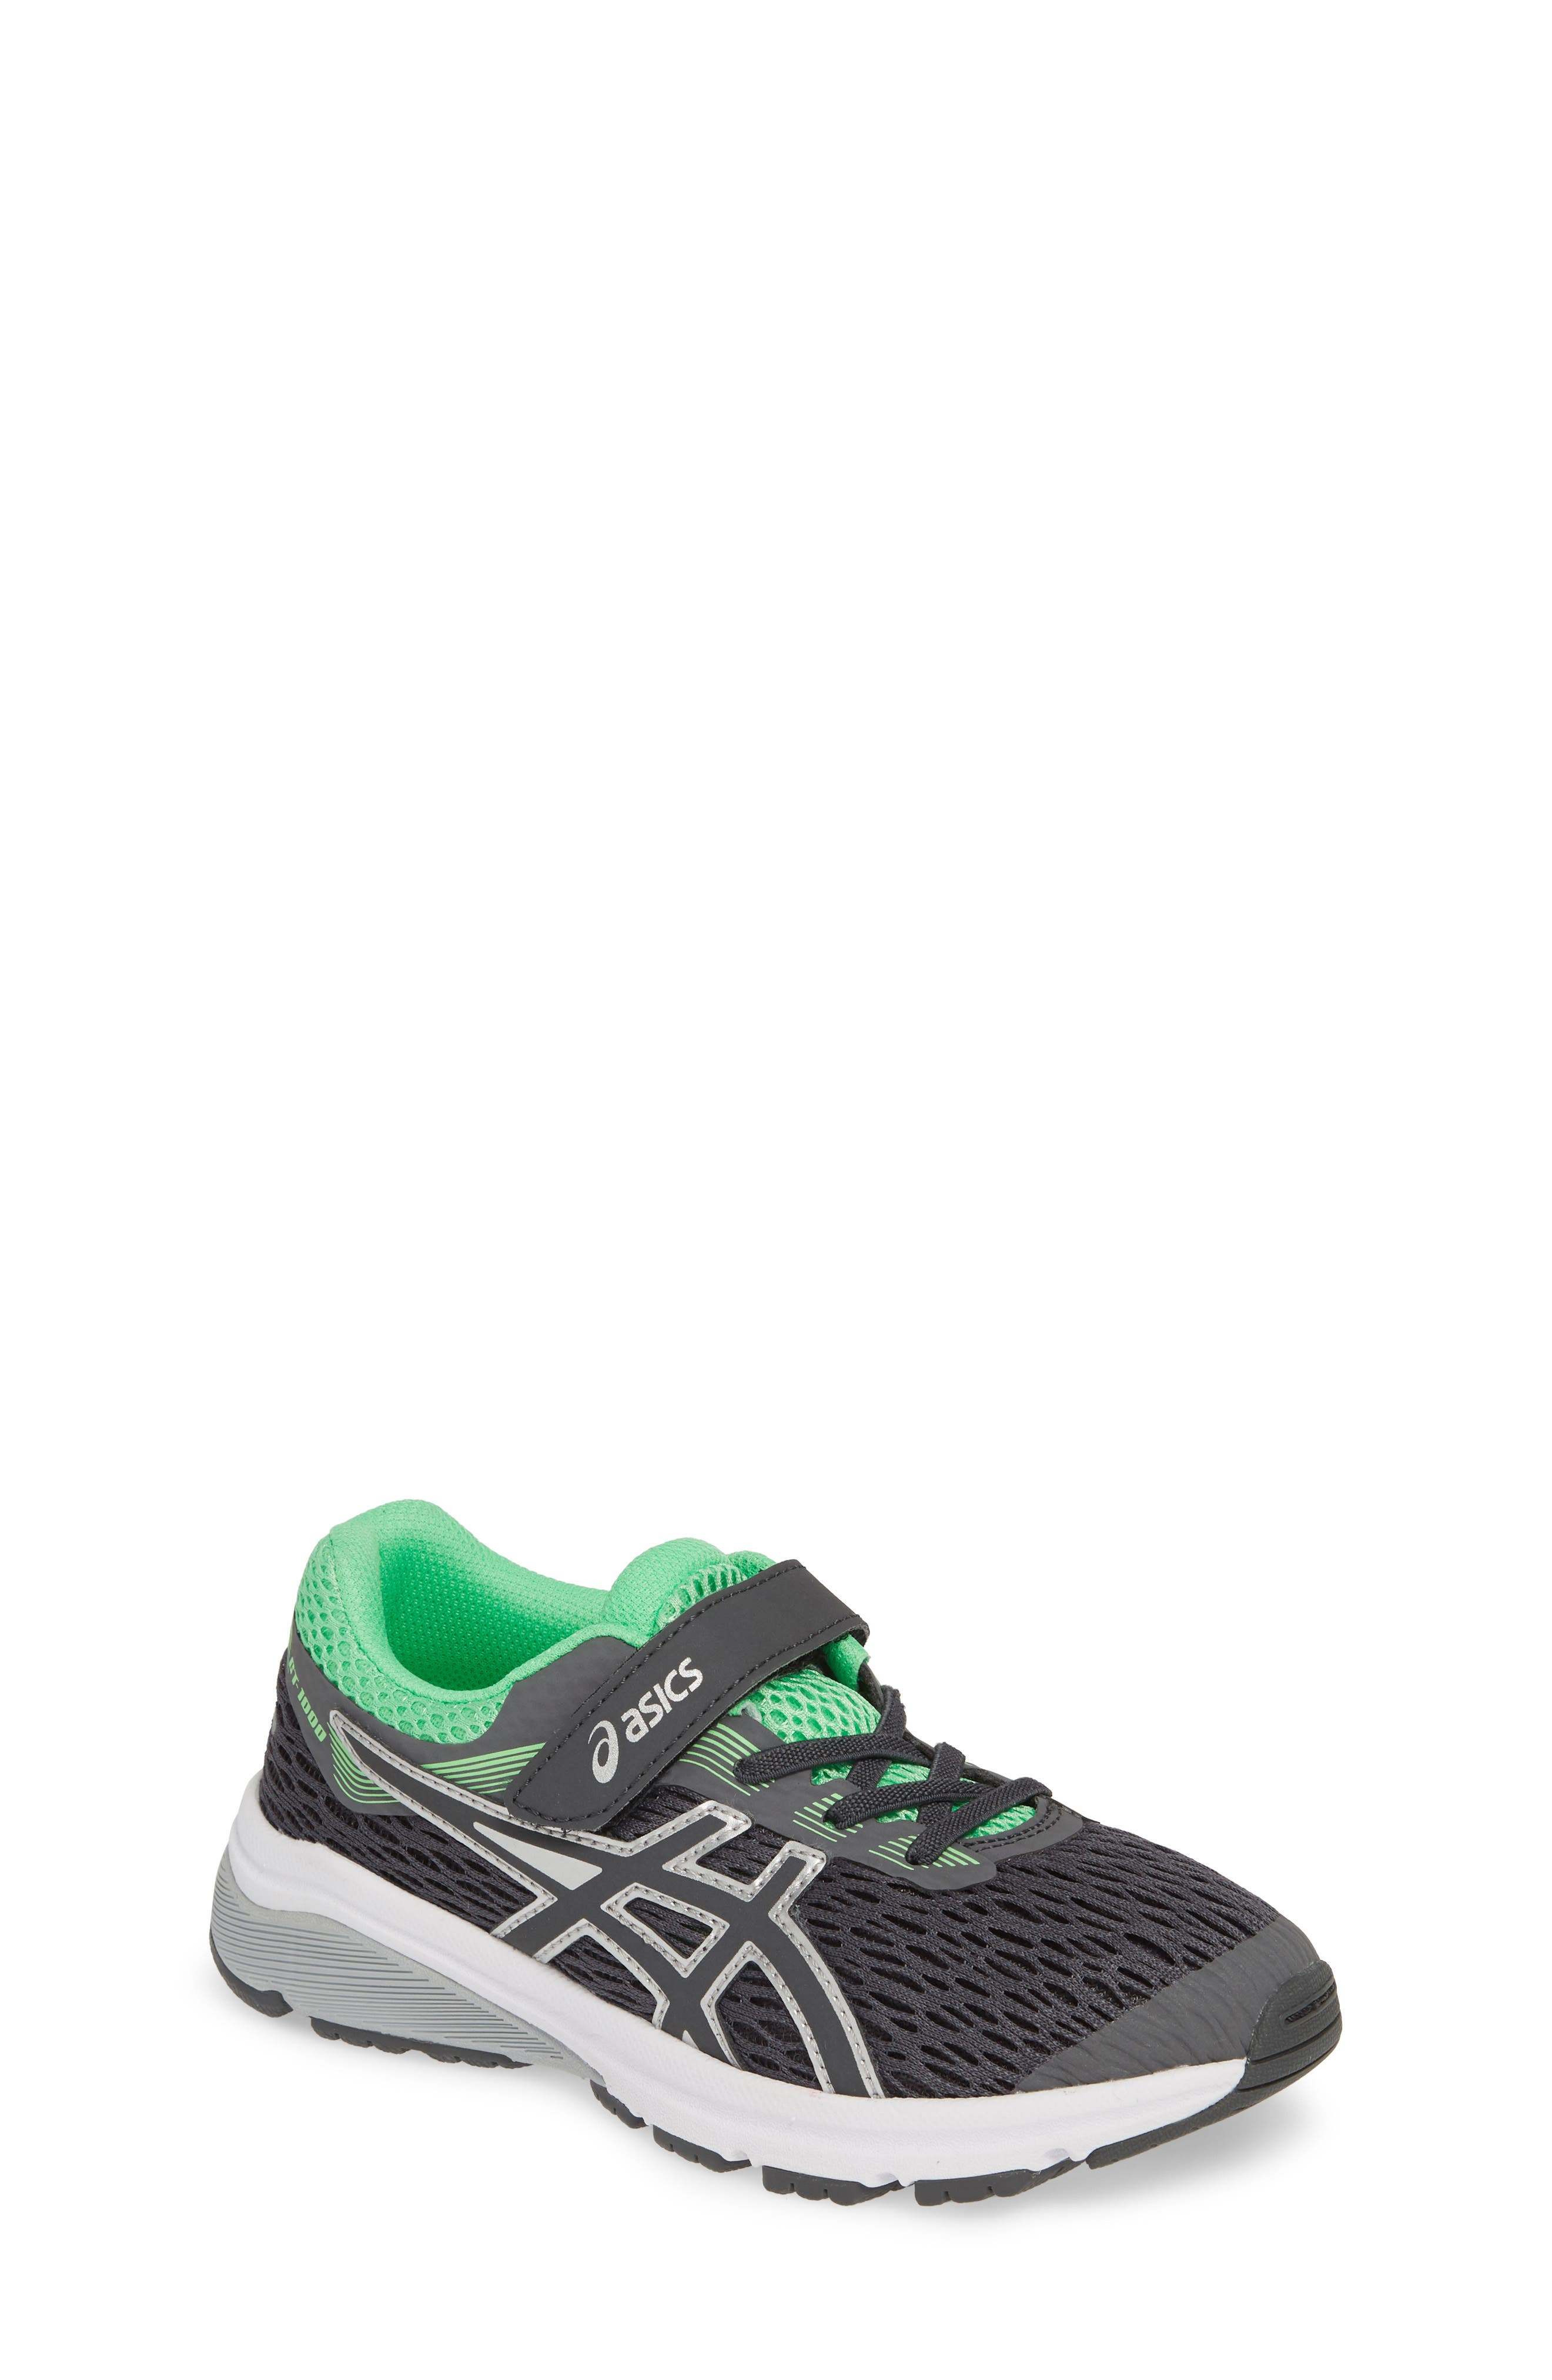 ASICS<SUP>®</SUP>, GT 1000 7 Running Shoe, Main thumbnail 1, color, DARK GREY/ DARK GREY